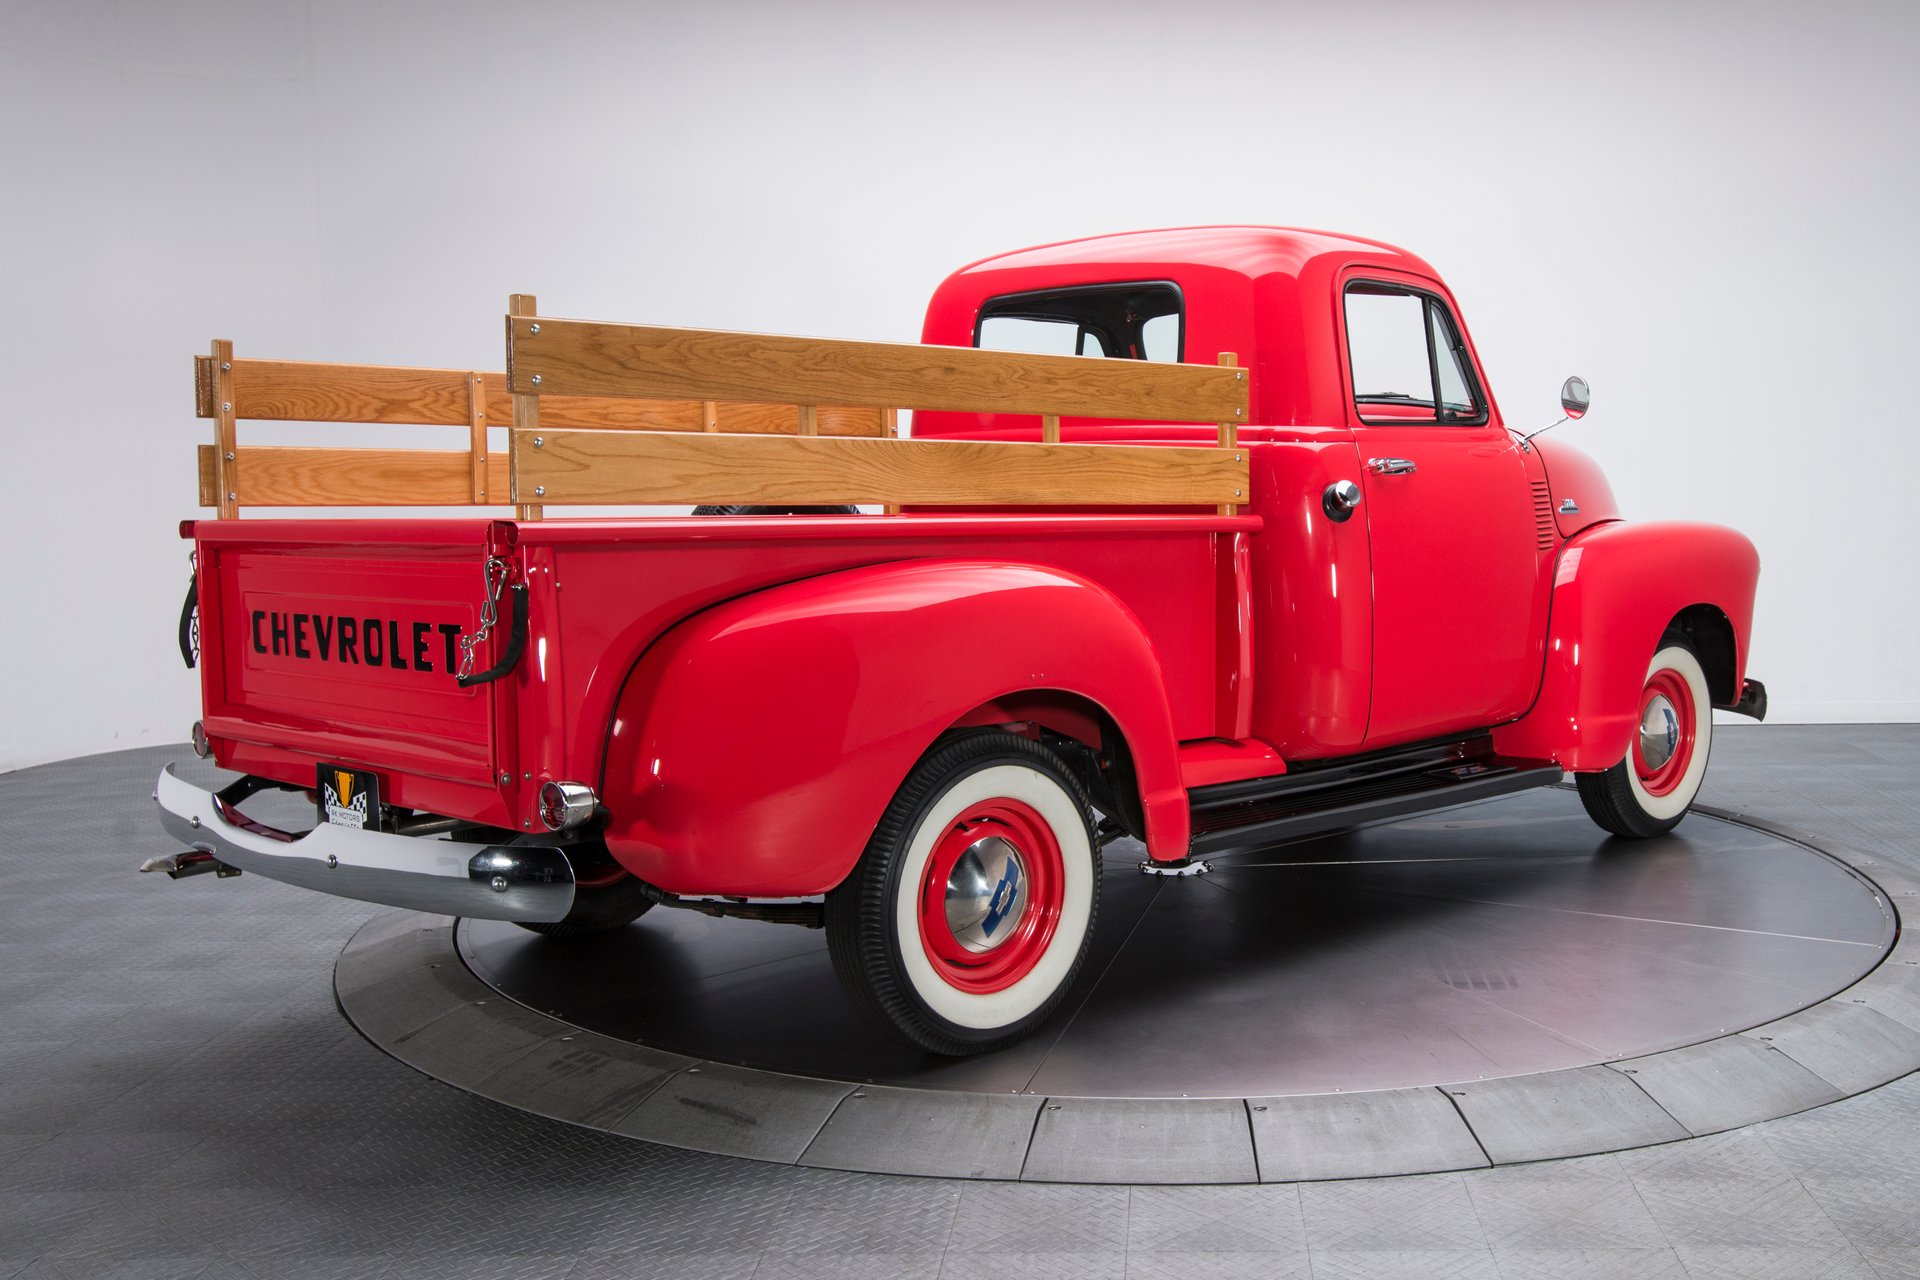 136046 1954 Chevrolet 3100 Pickup Truck Rk Motors Classic Cars For Sale